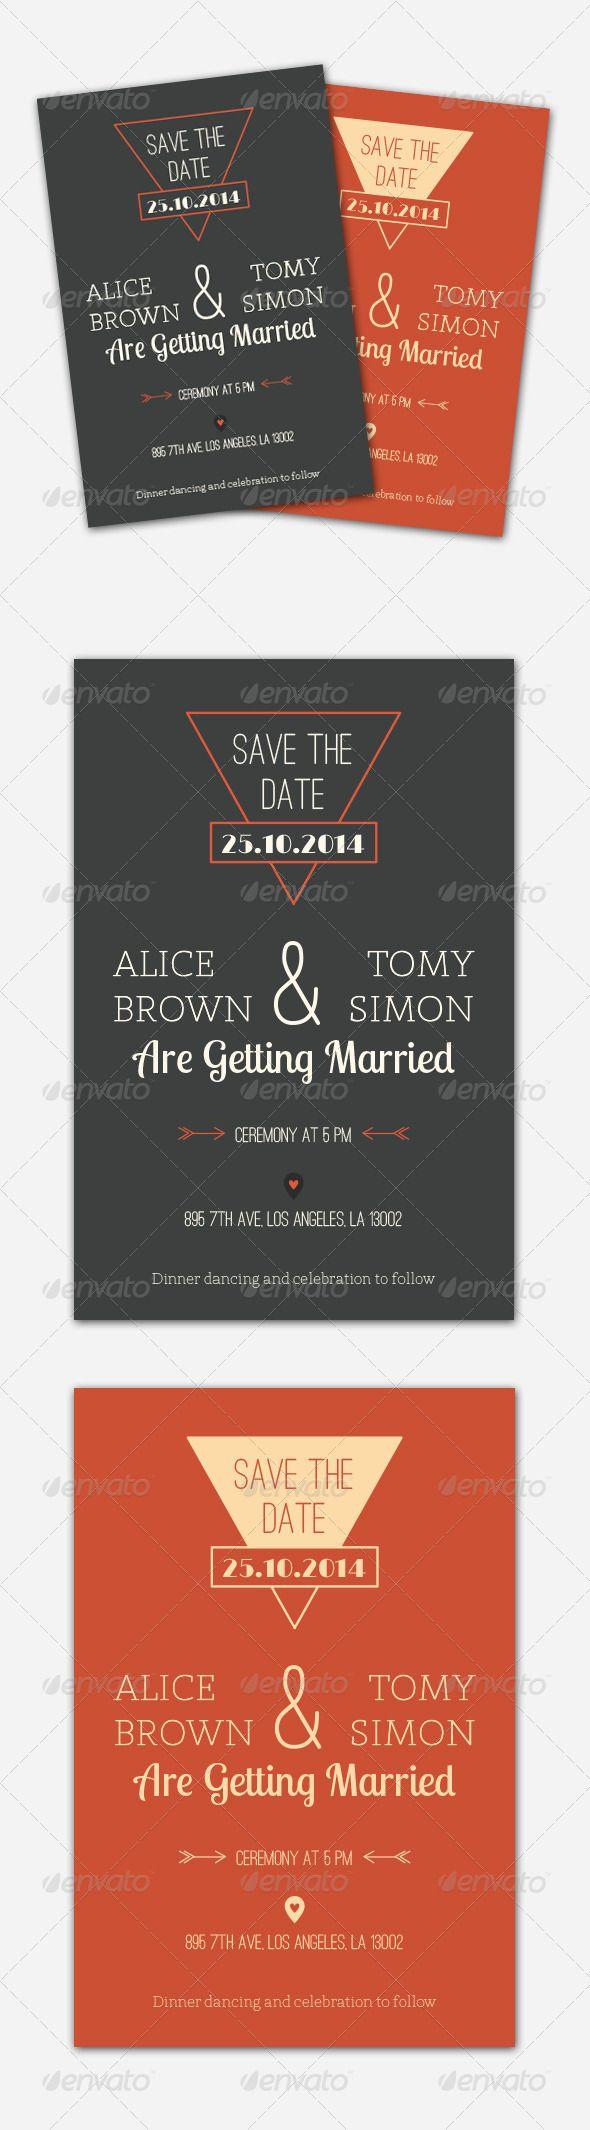 Wedding Invitation Card | Pinterest | Wedding invitation cards ...